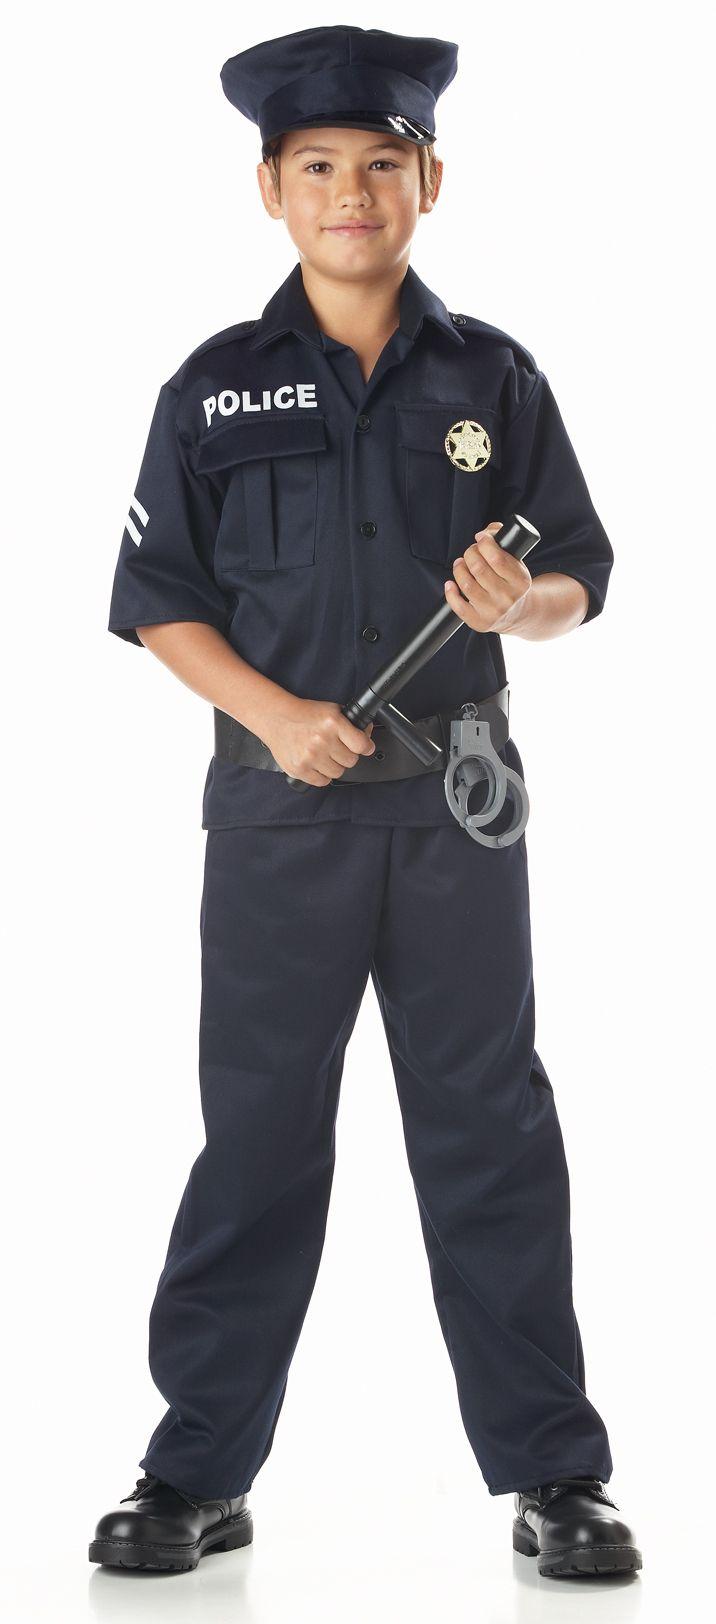 25 best australian police uniforms images on pinterest police